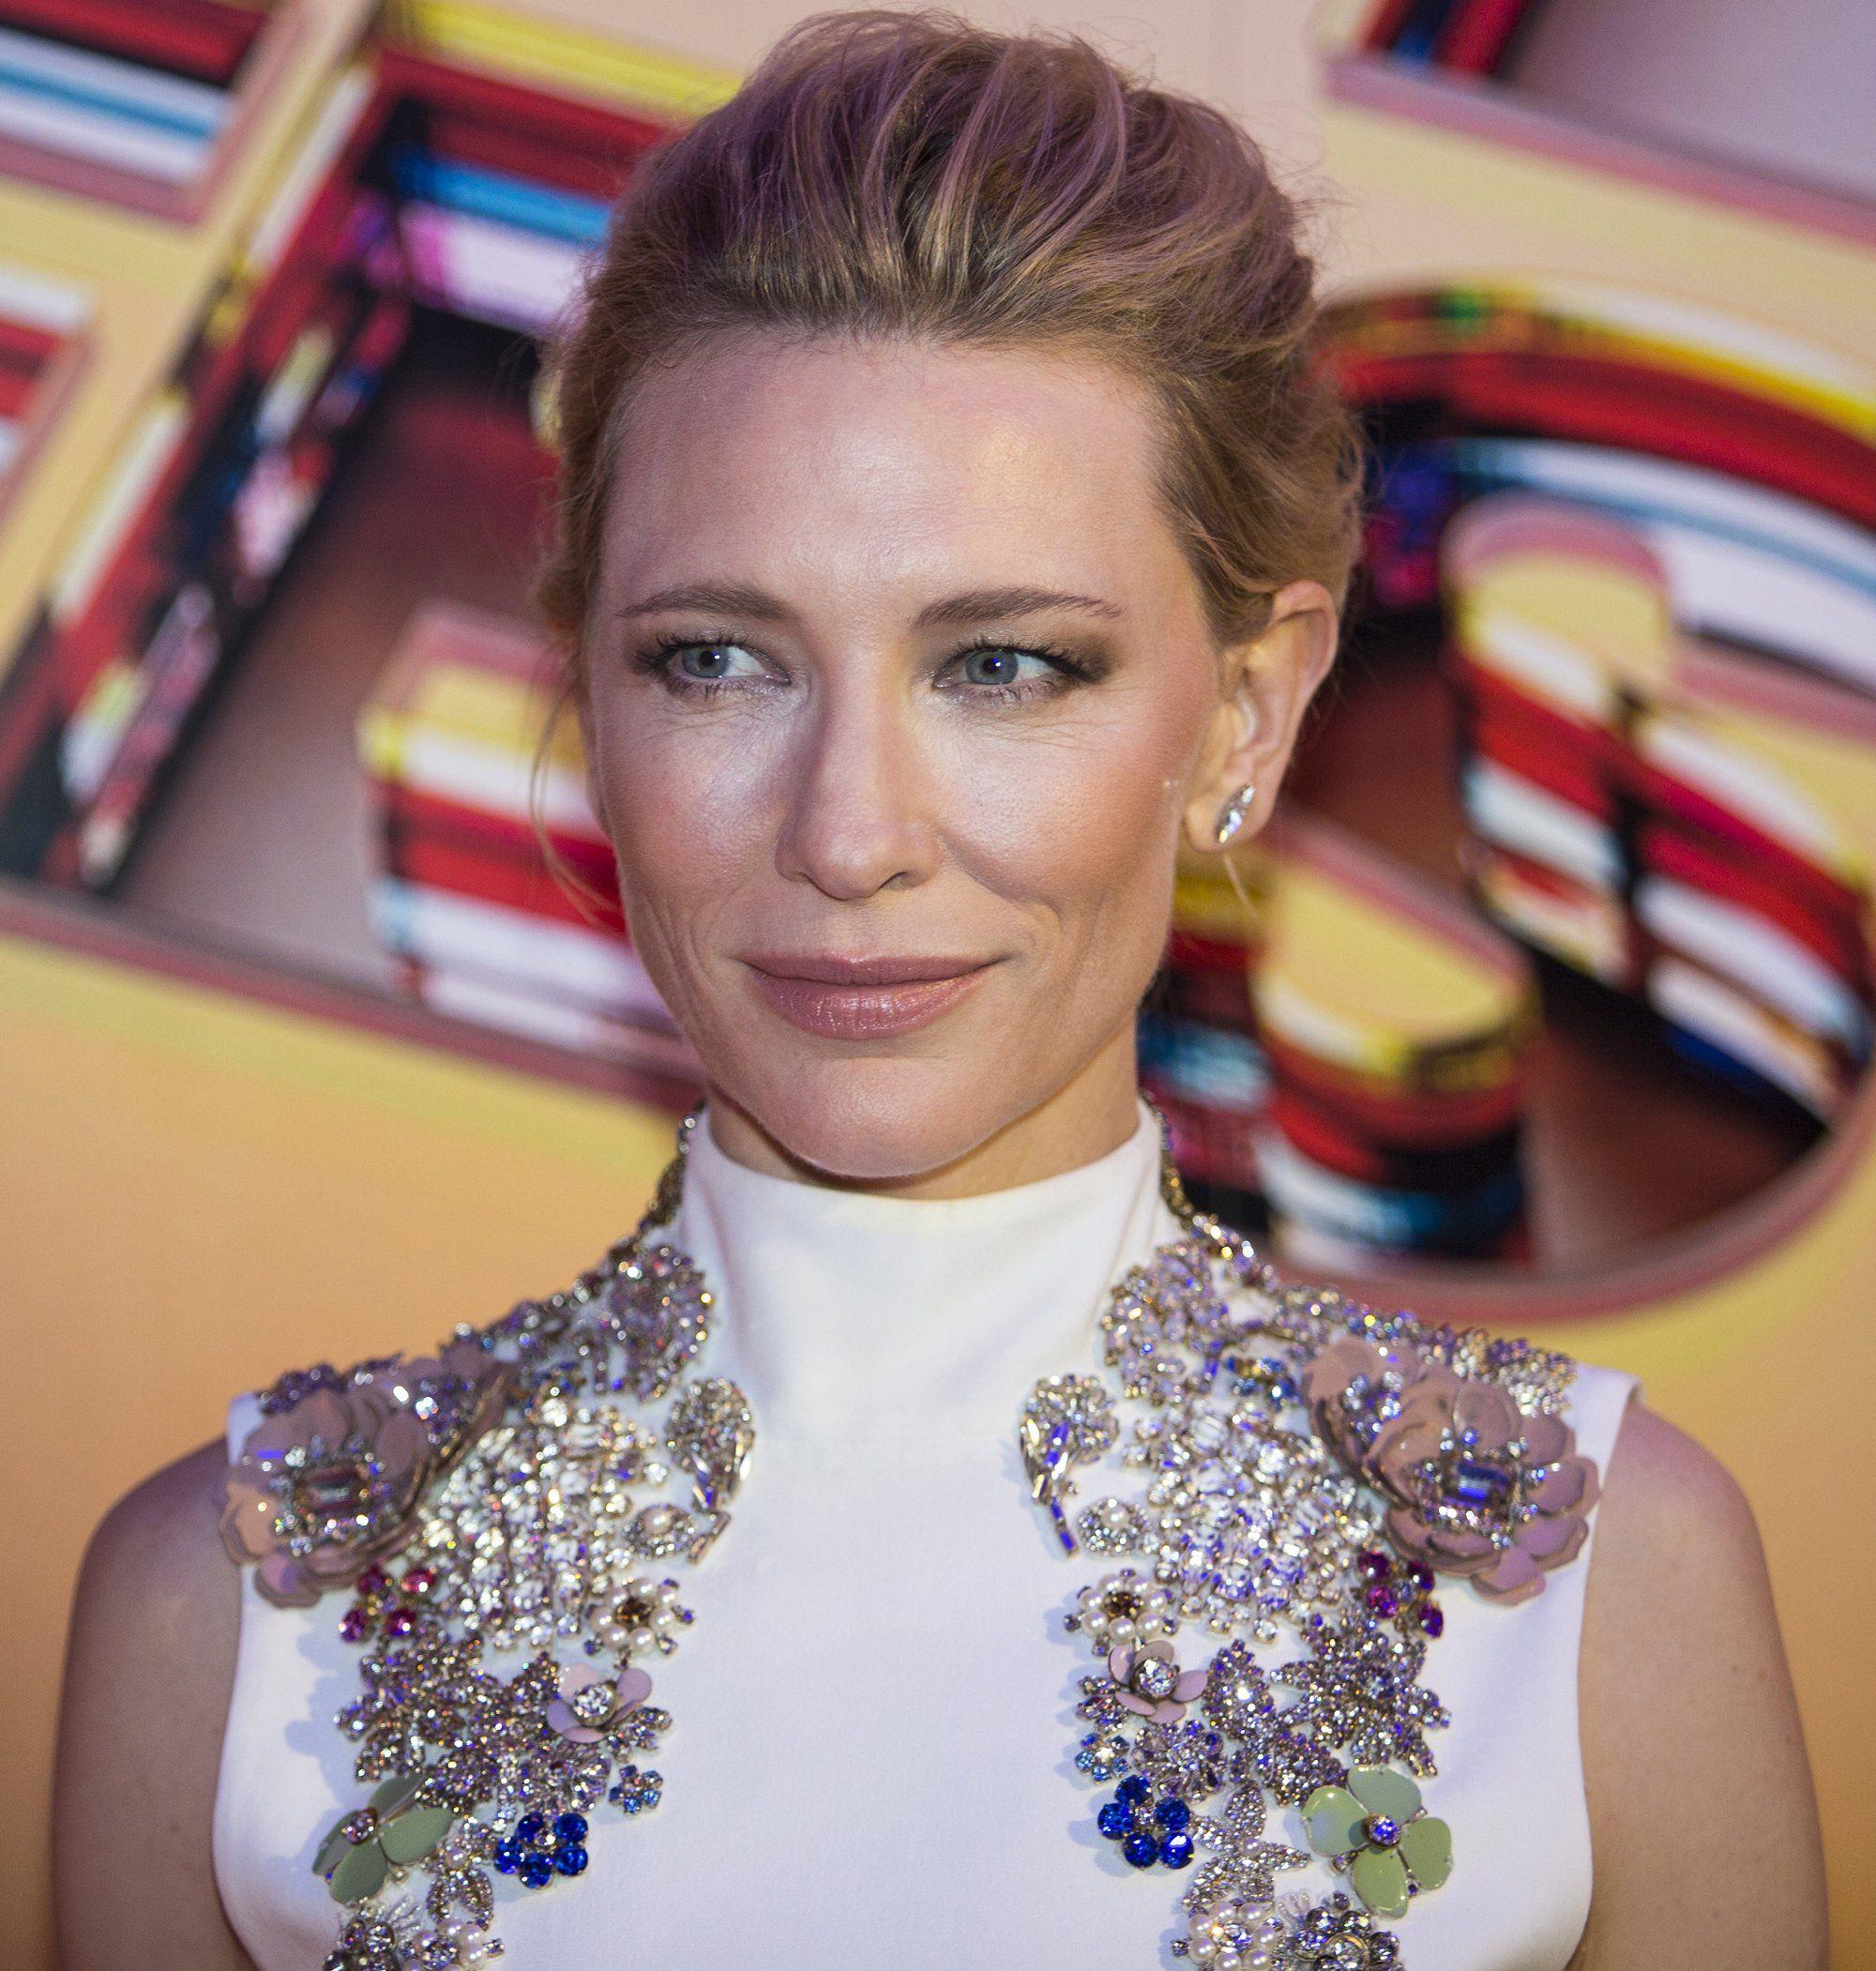 Cate Blanchett Photos (มีรูปภาพ)